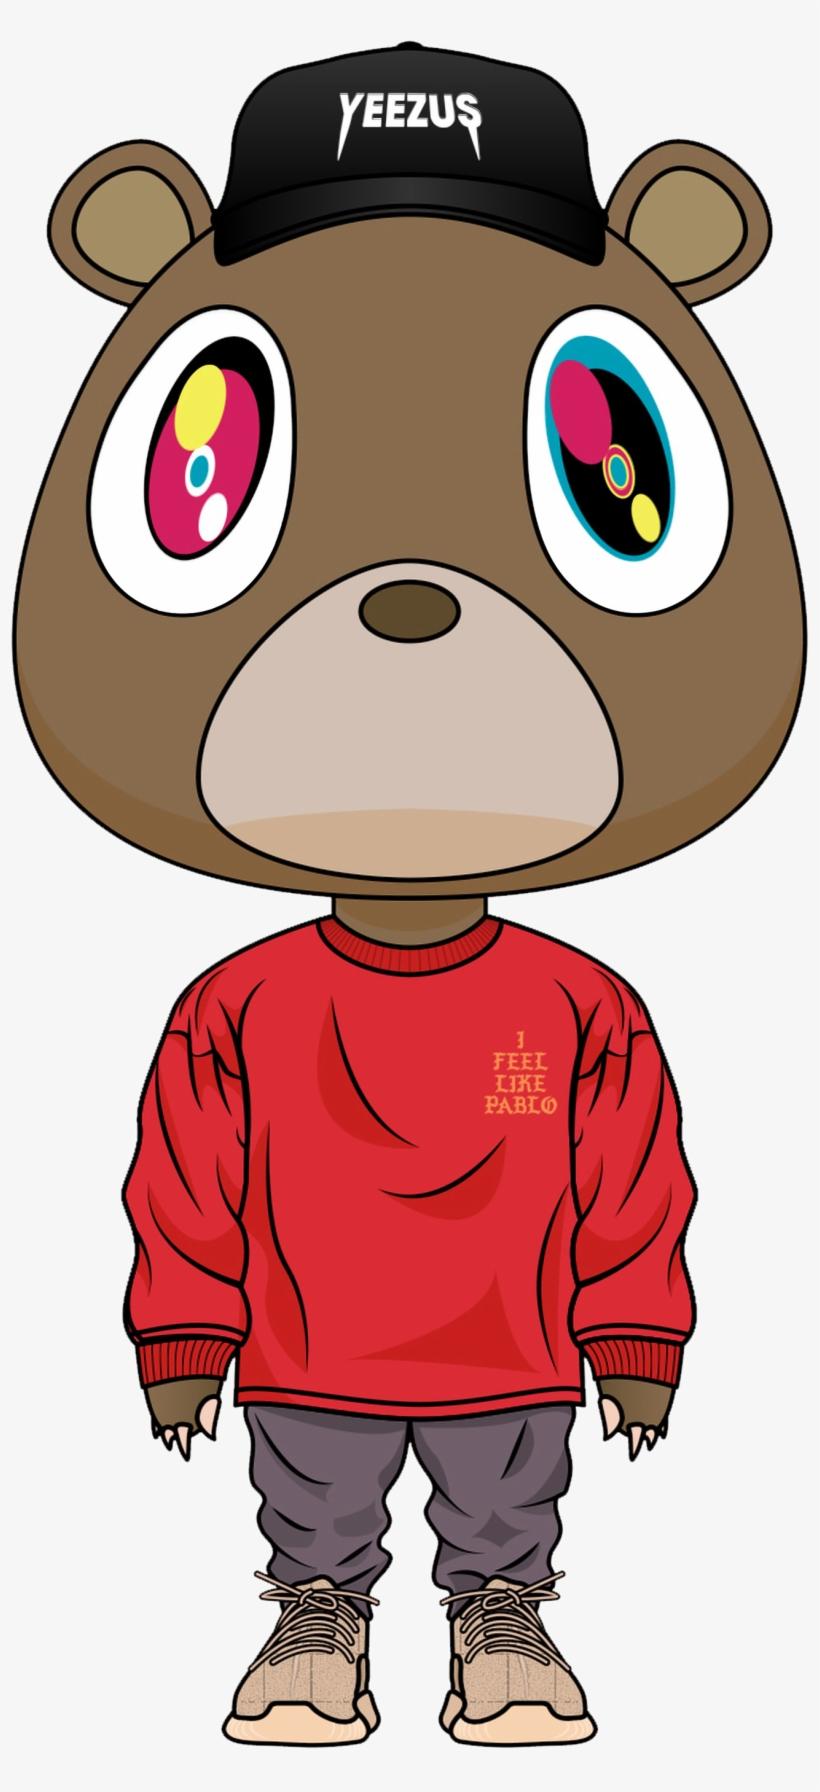 e5b0c2a3ef5cf Kanye Pablo Dropout Bear Kanye Png Yeezus Bear PNG Image ...